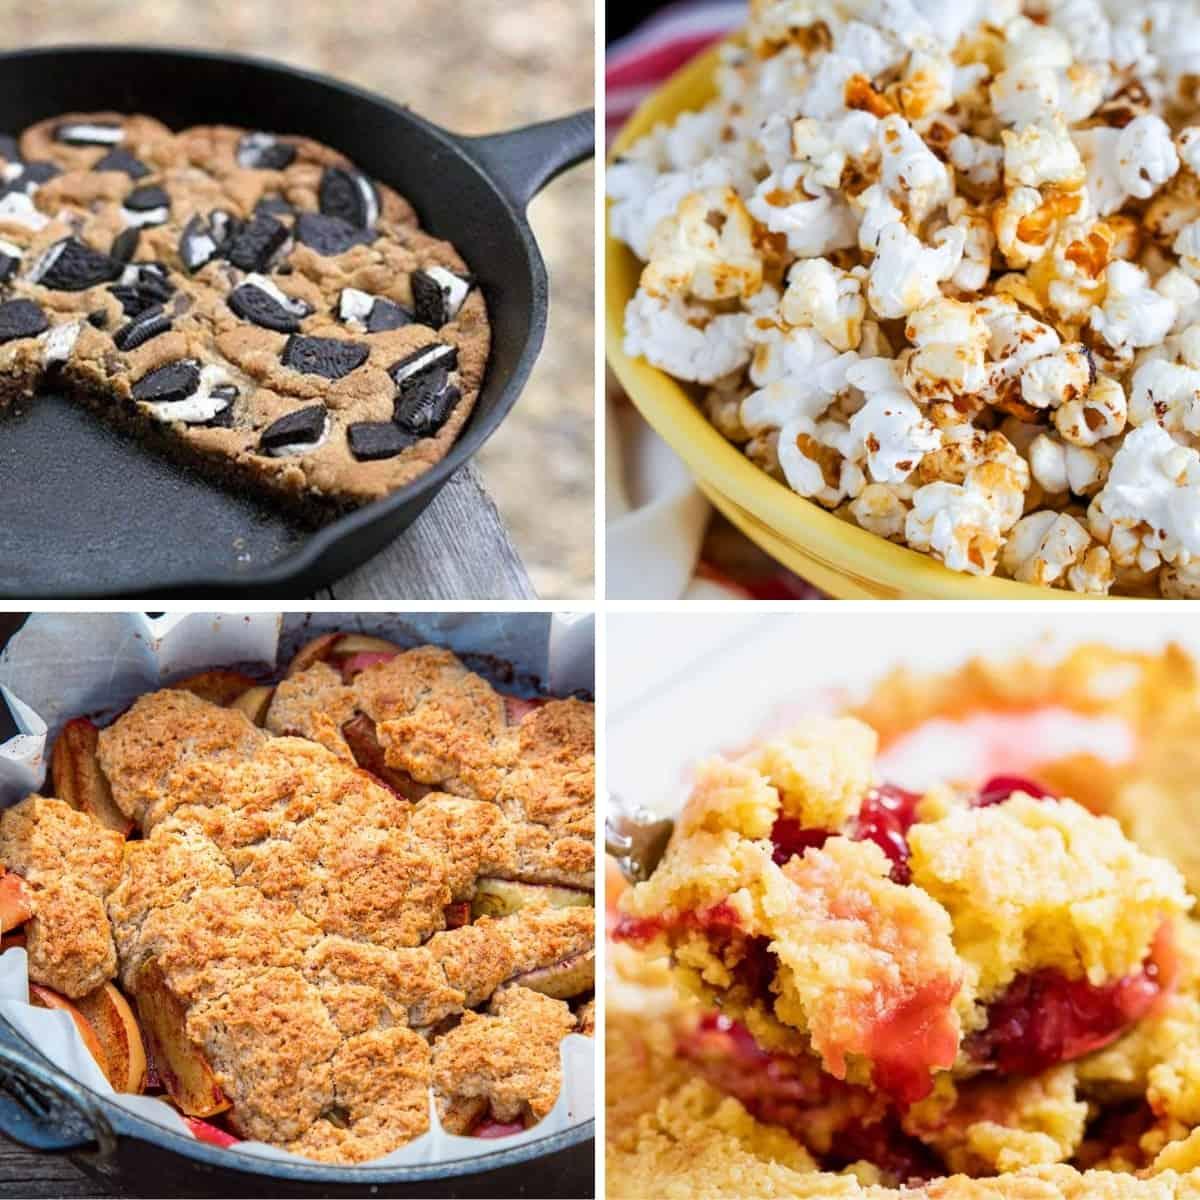 Dutch Oven Desserts 30 Best Camping Recipes Seeking The Rv Life